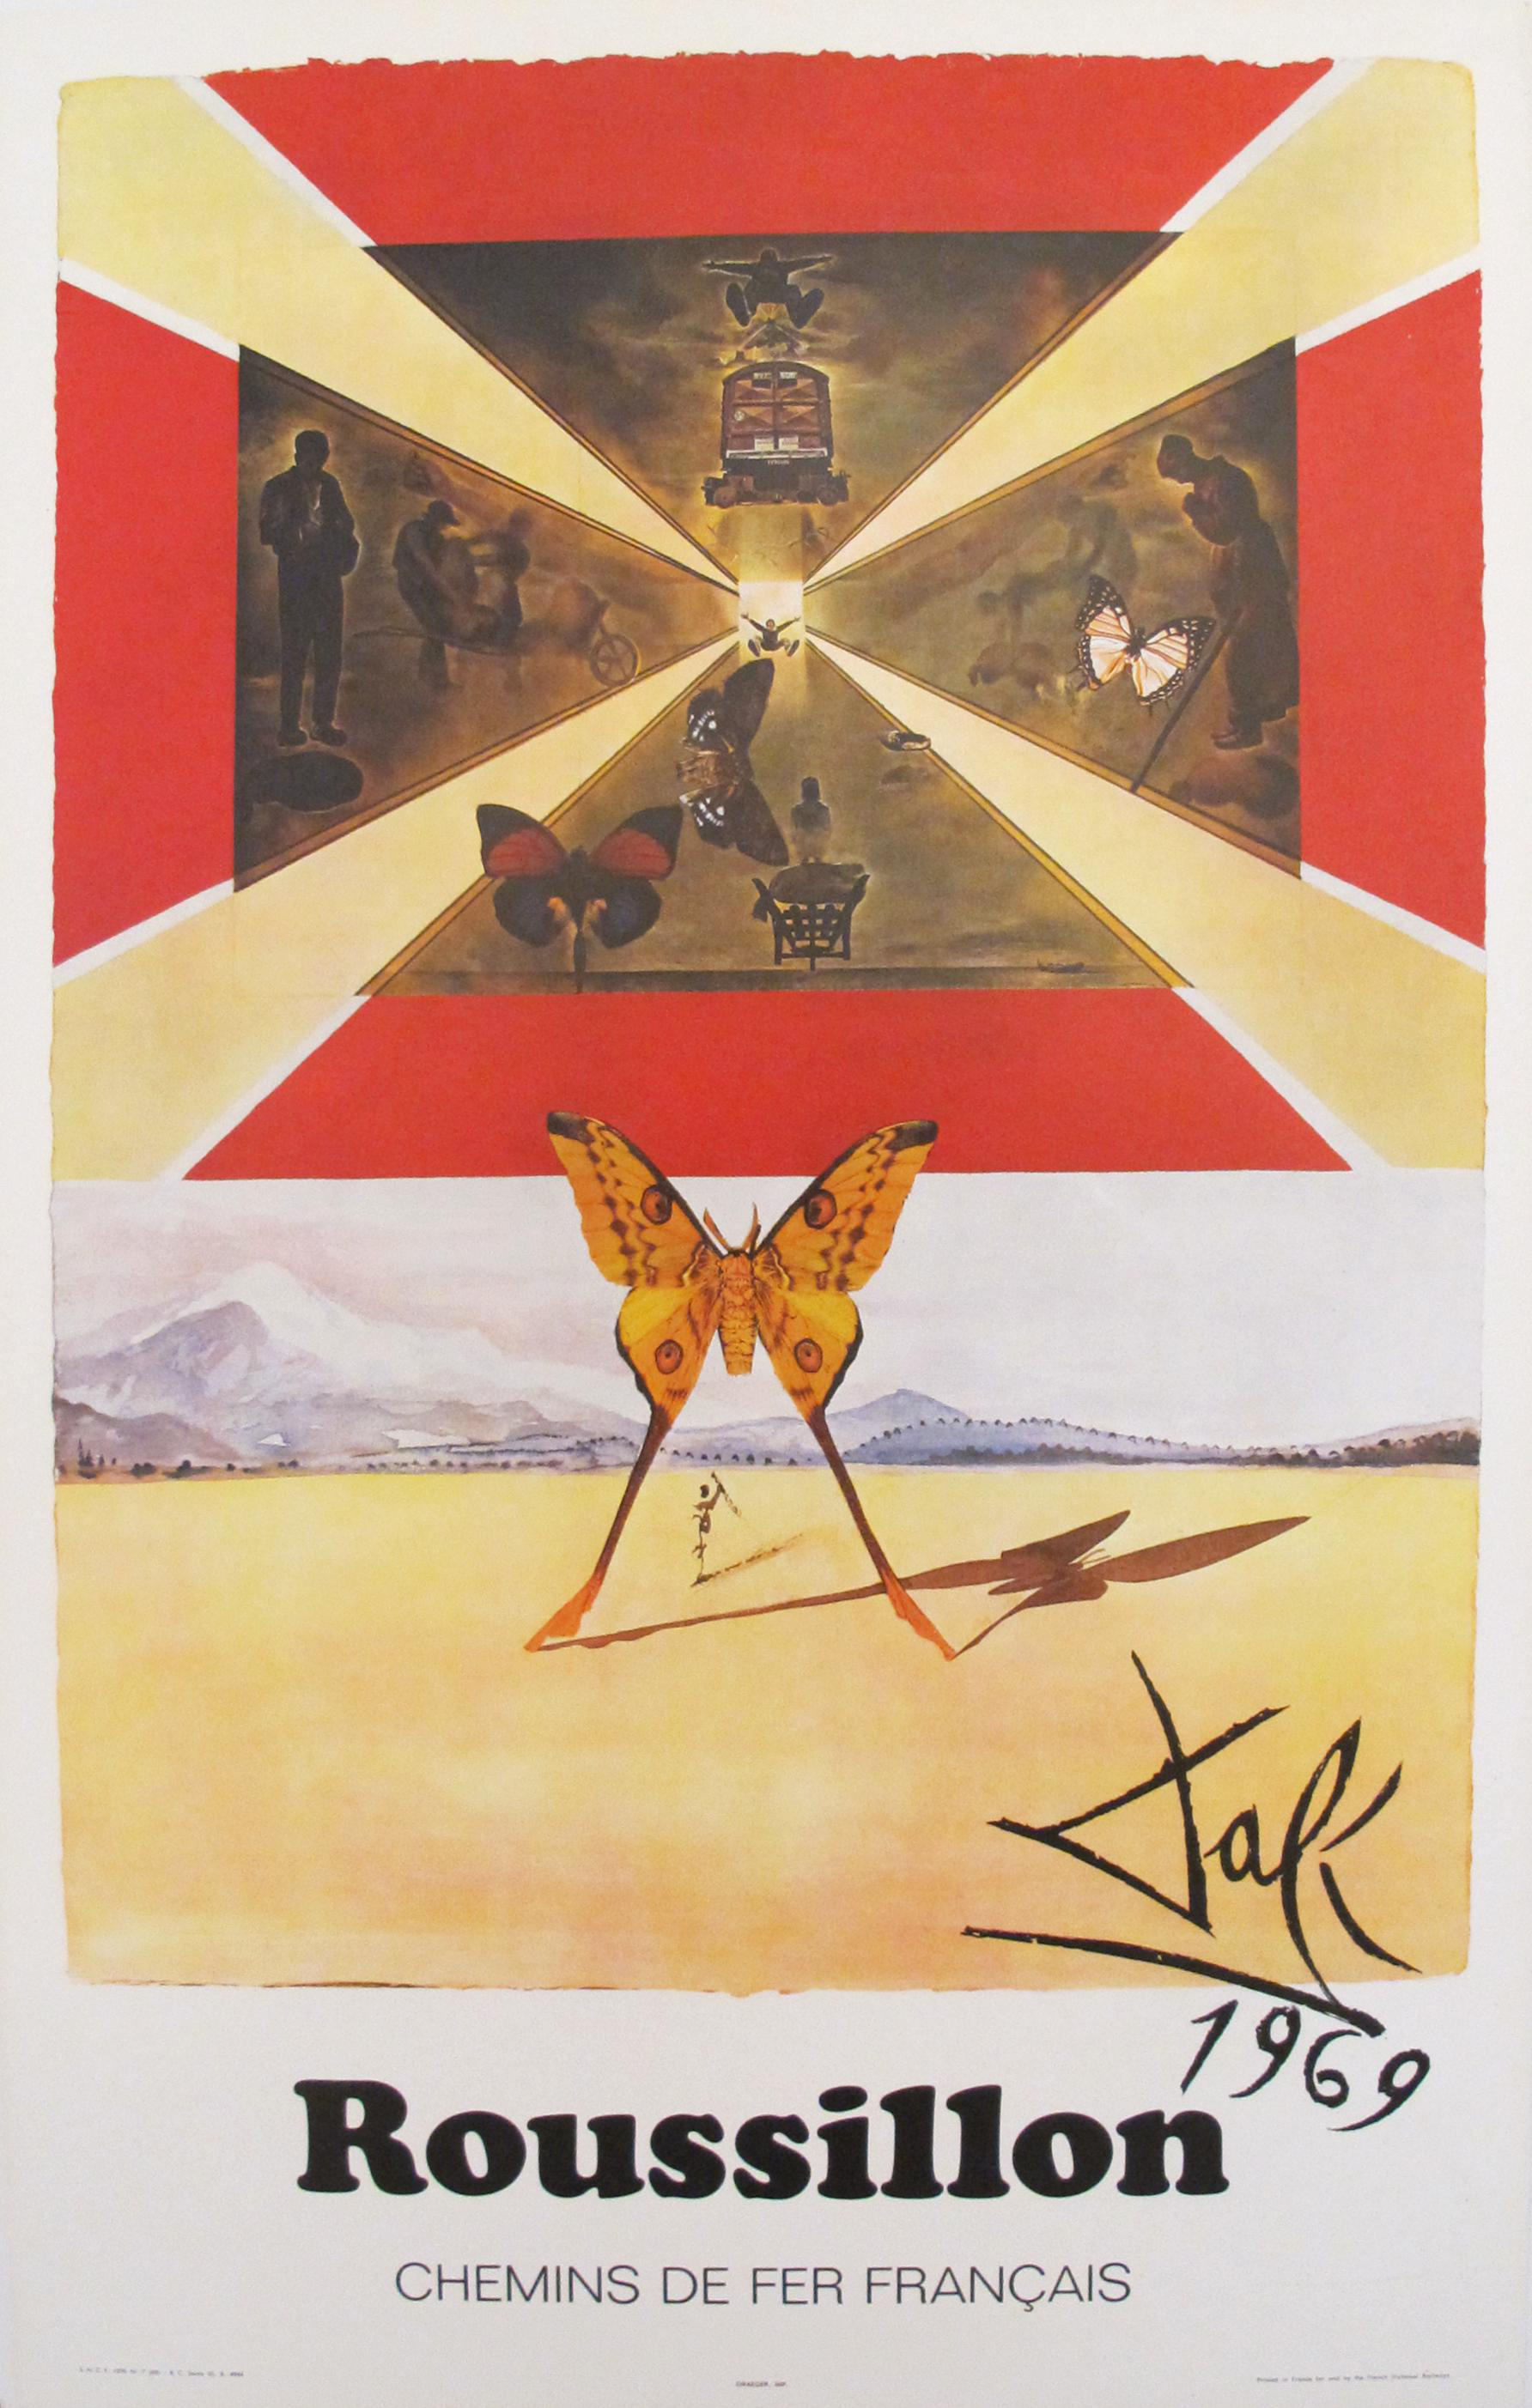 1969 Salvador Dali SNCF Roussillon France Travel Poster | Chairish